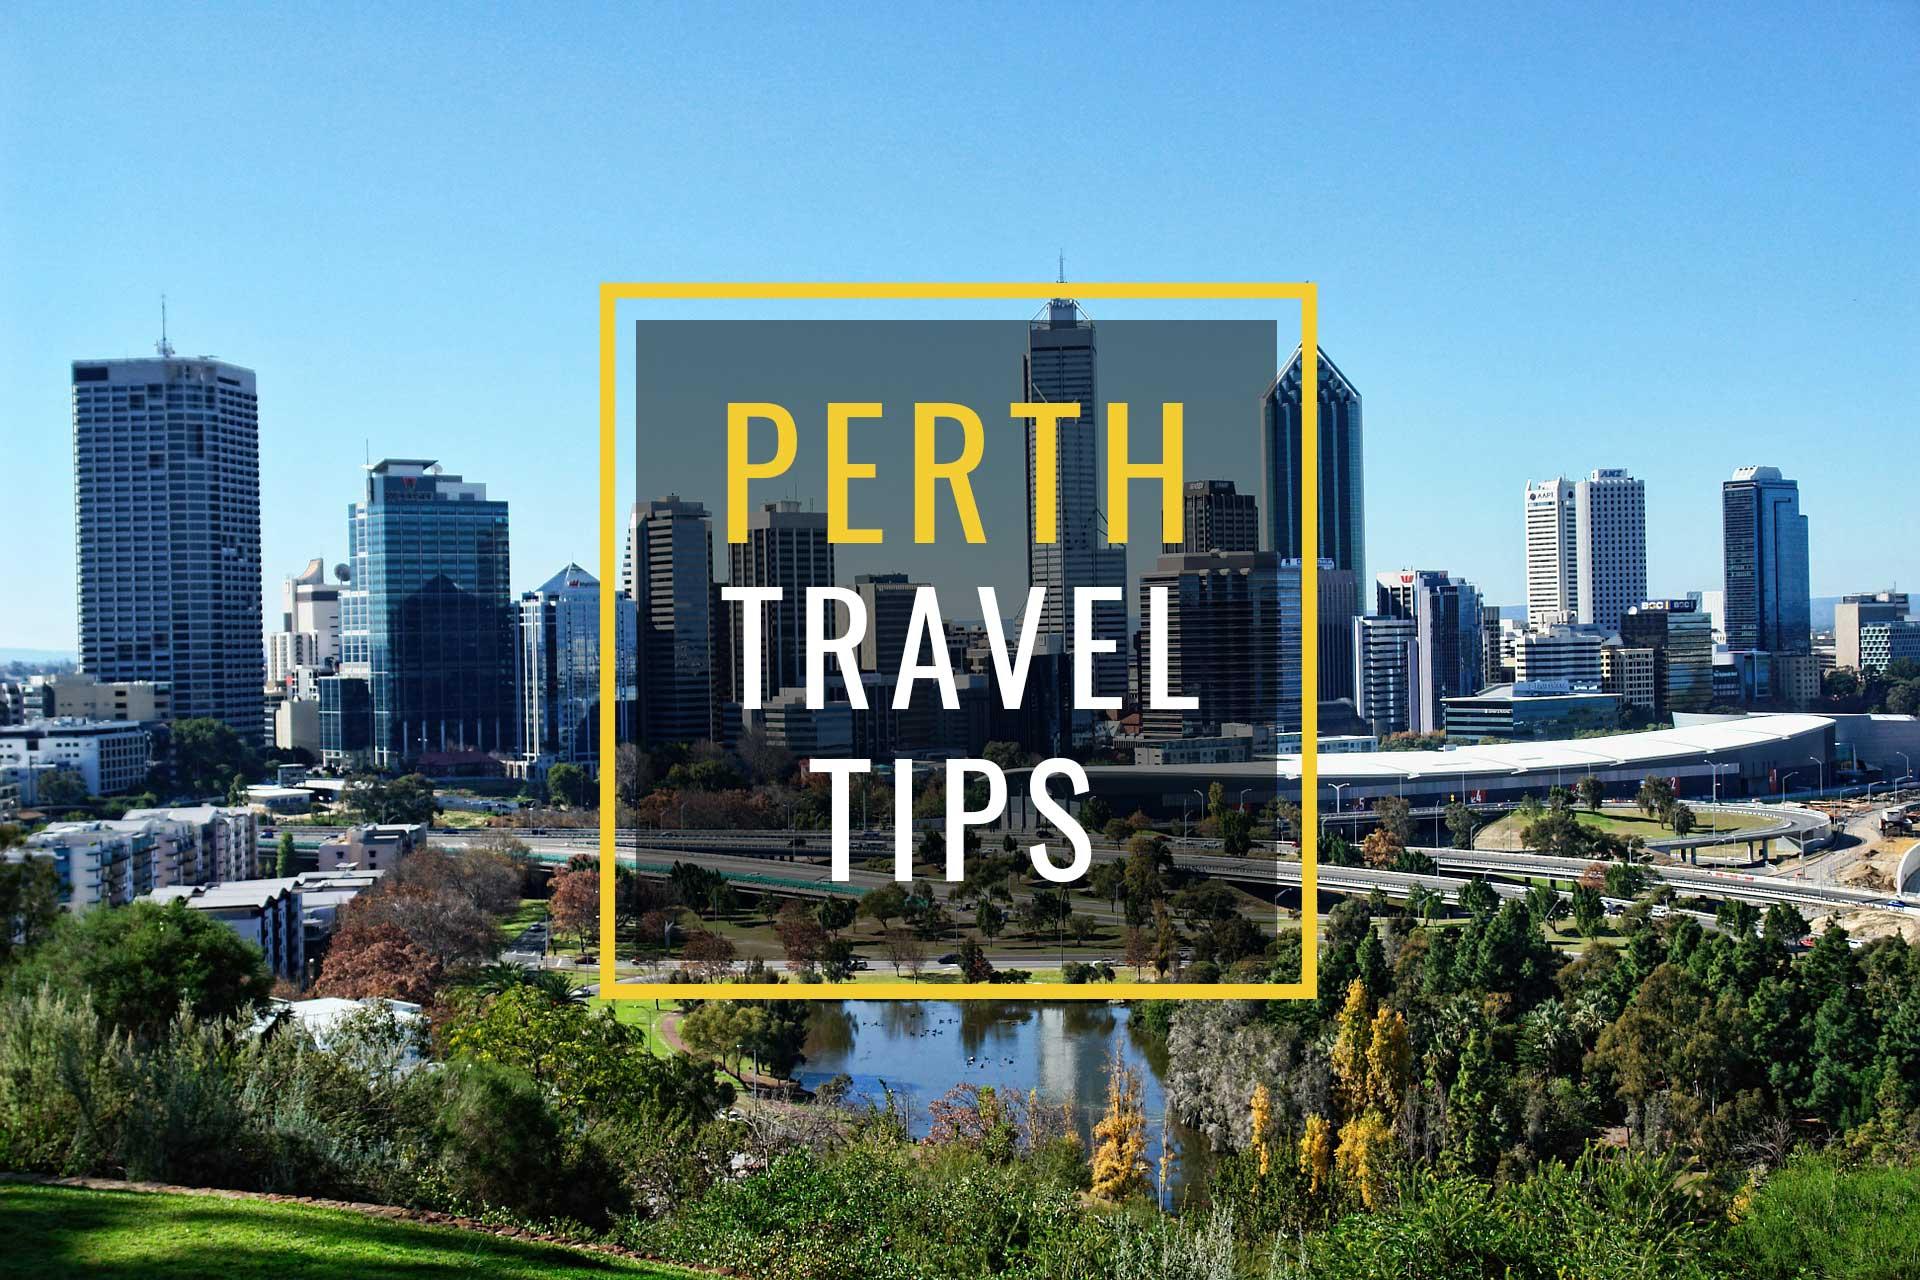 Perth Travel Tips - Australia Backpackers Guide e5544de894461